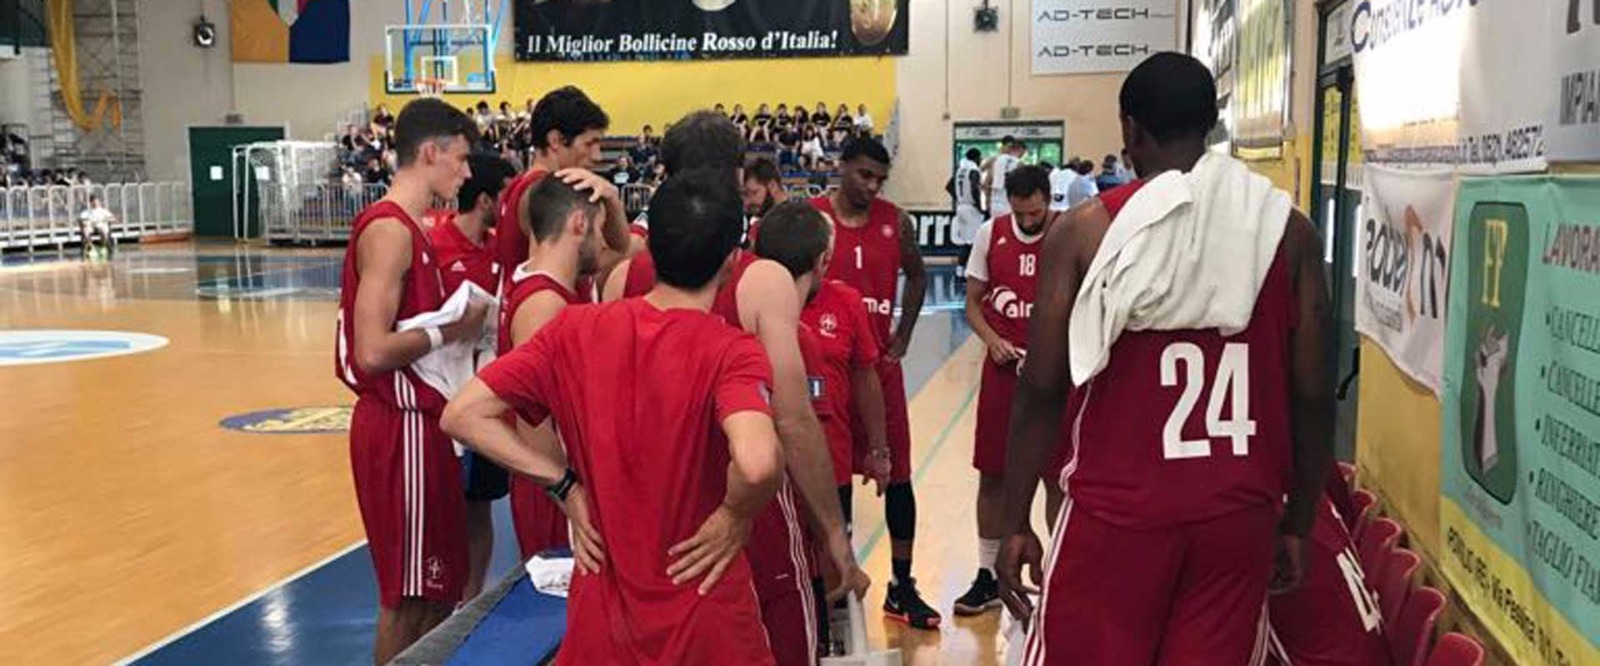 Alma pallacanestro Trieste time-out